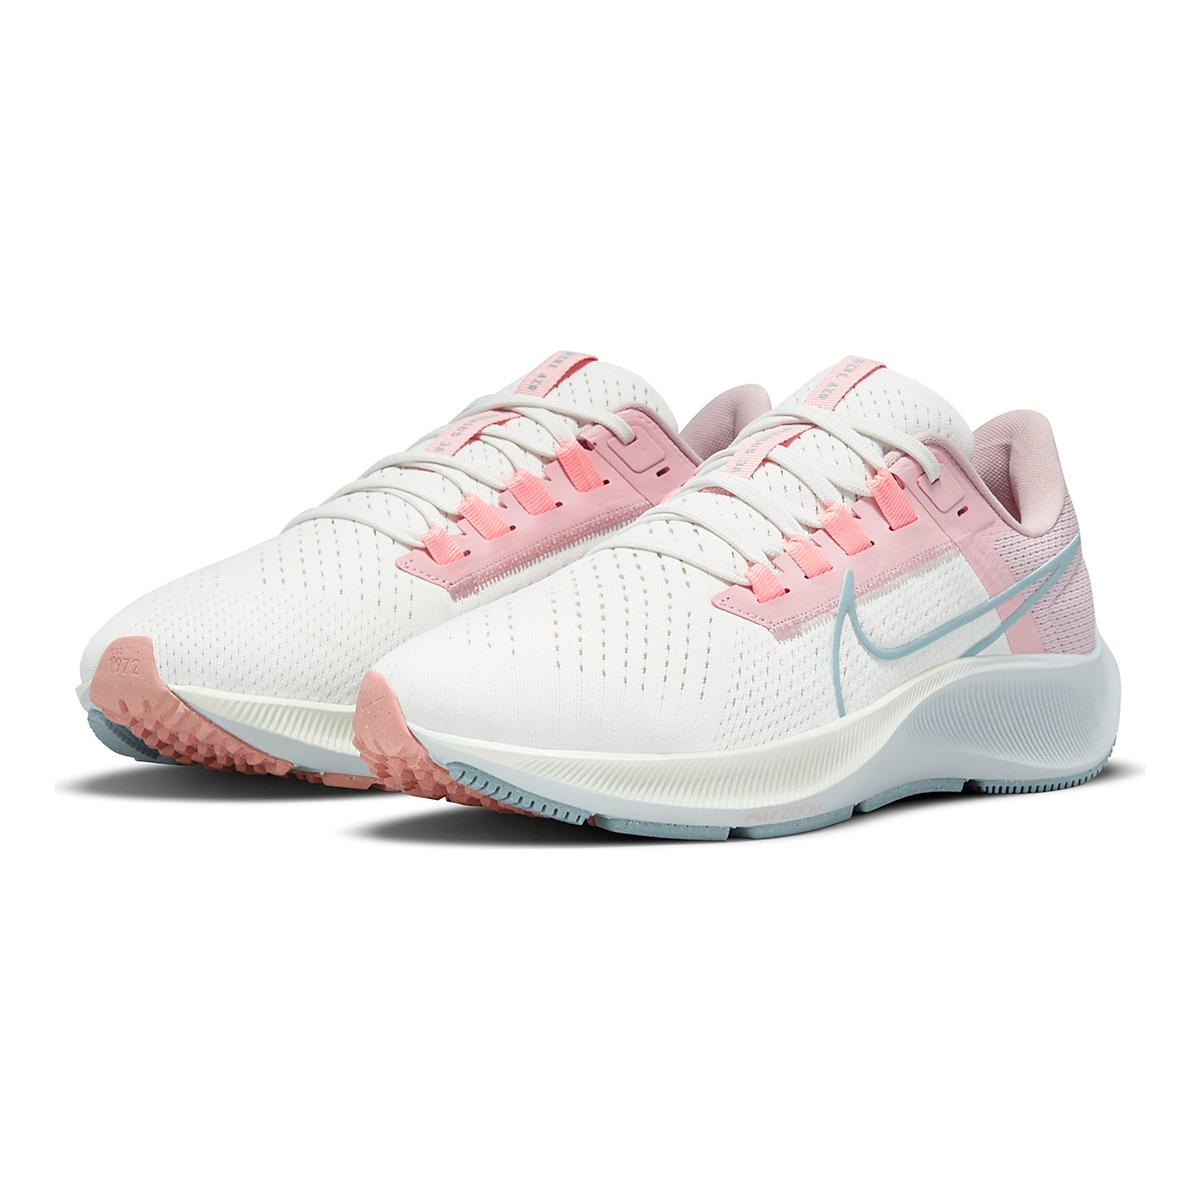 Women's Nike Air Zoom Pegasus 38 Running Shoe - Color: Sail/Ocean Cube/Pink Glaze/Crimson Bliss - Size: 5 - Width: Regular, Sail/Ocean Cube/Pink Glaze/Crimson Bliss, large, image 3